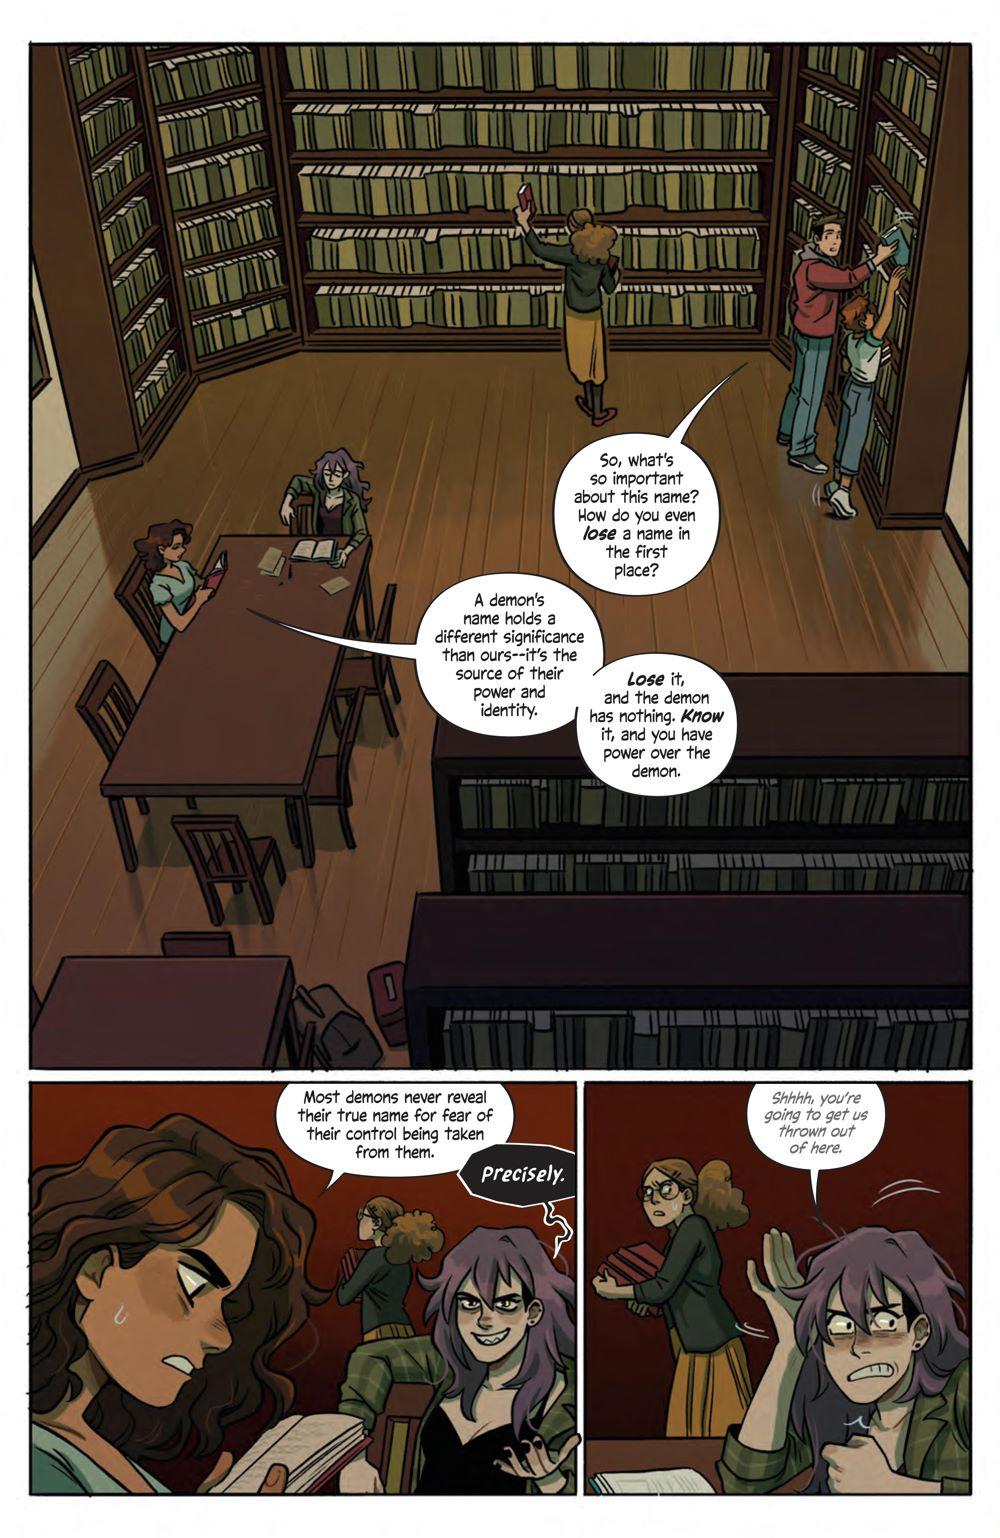 SpecterInspectors_002_PRESS_8 ComicList Previews: SPECTER INSPECTORS #2 (OF 5)